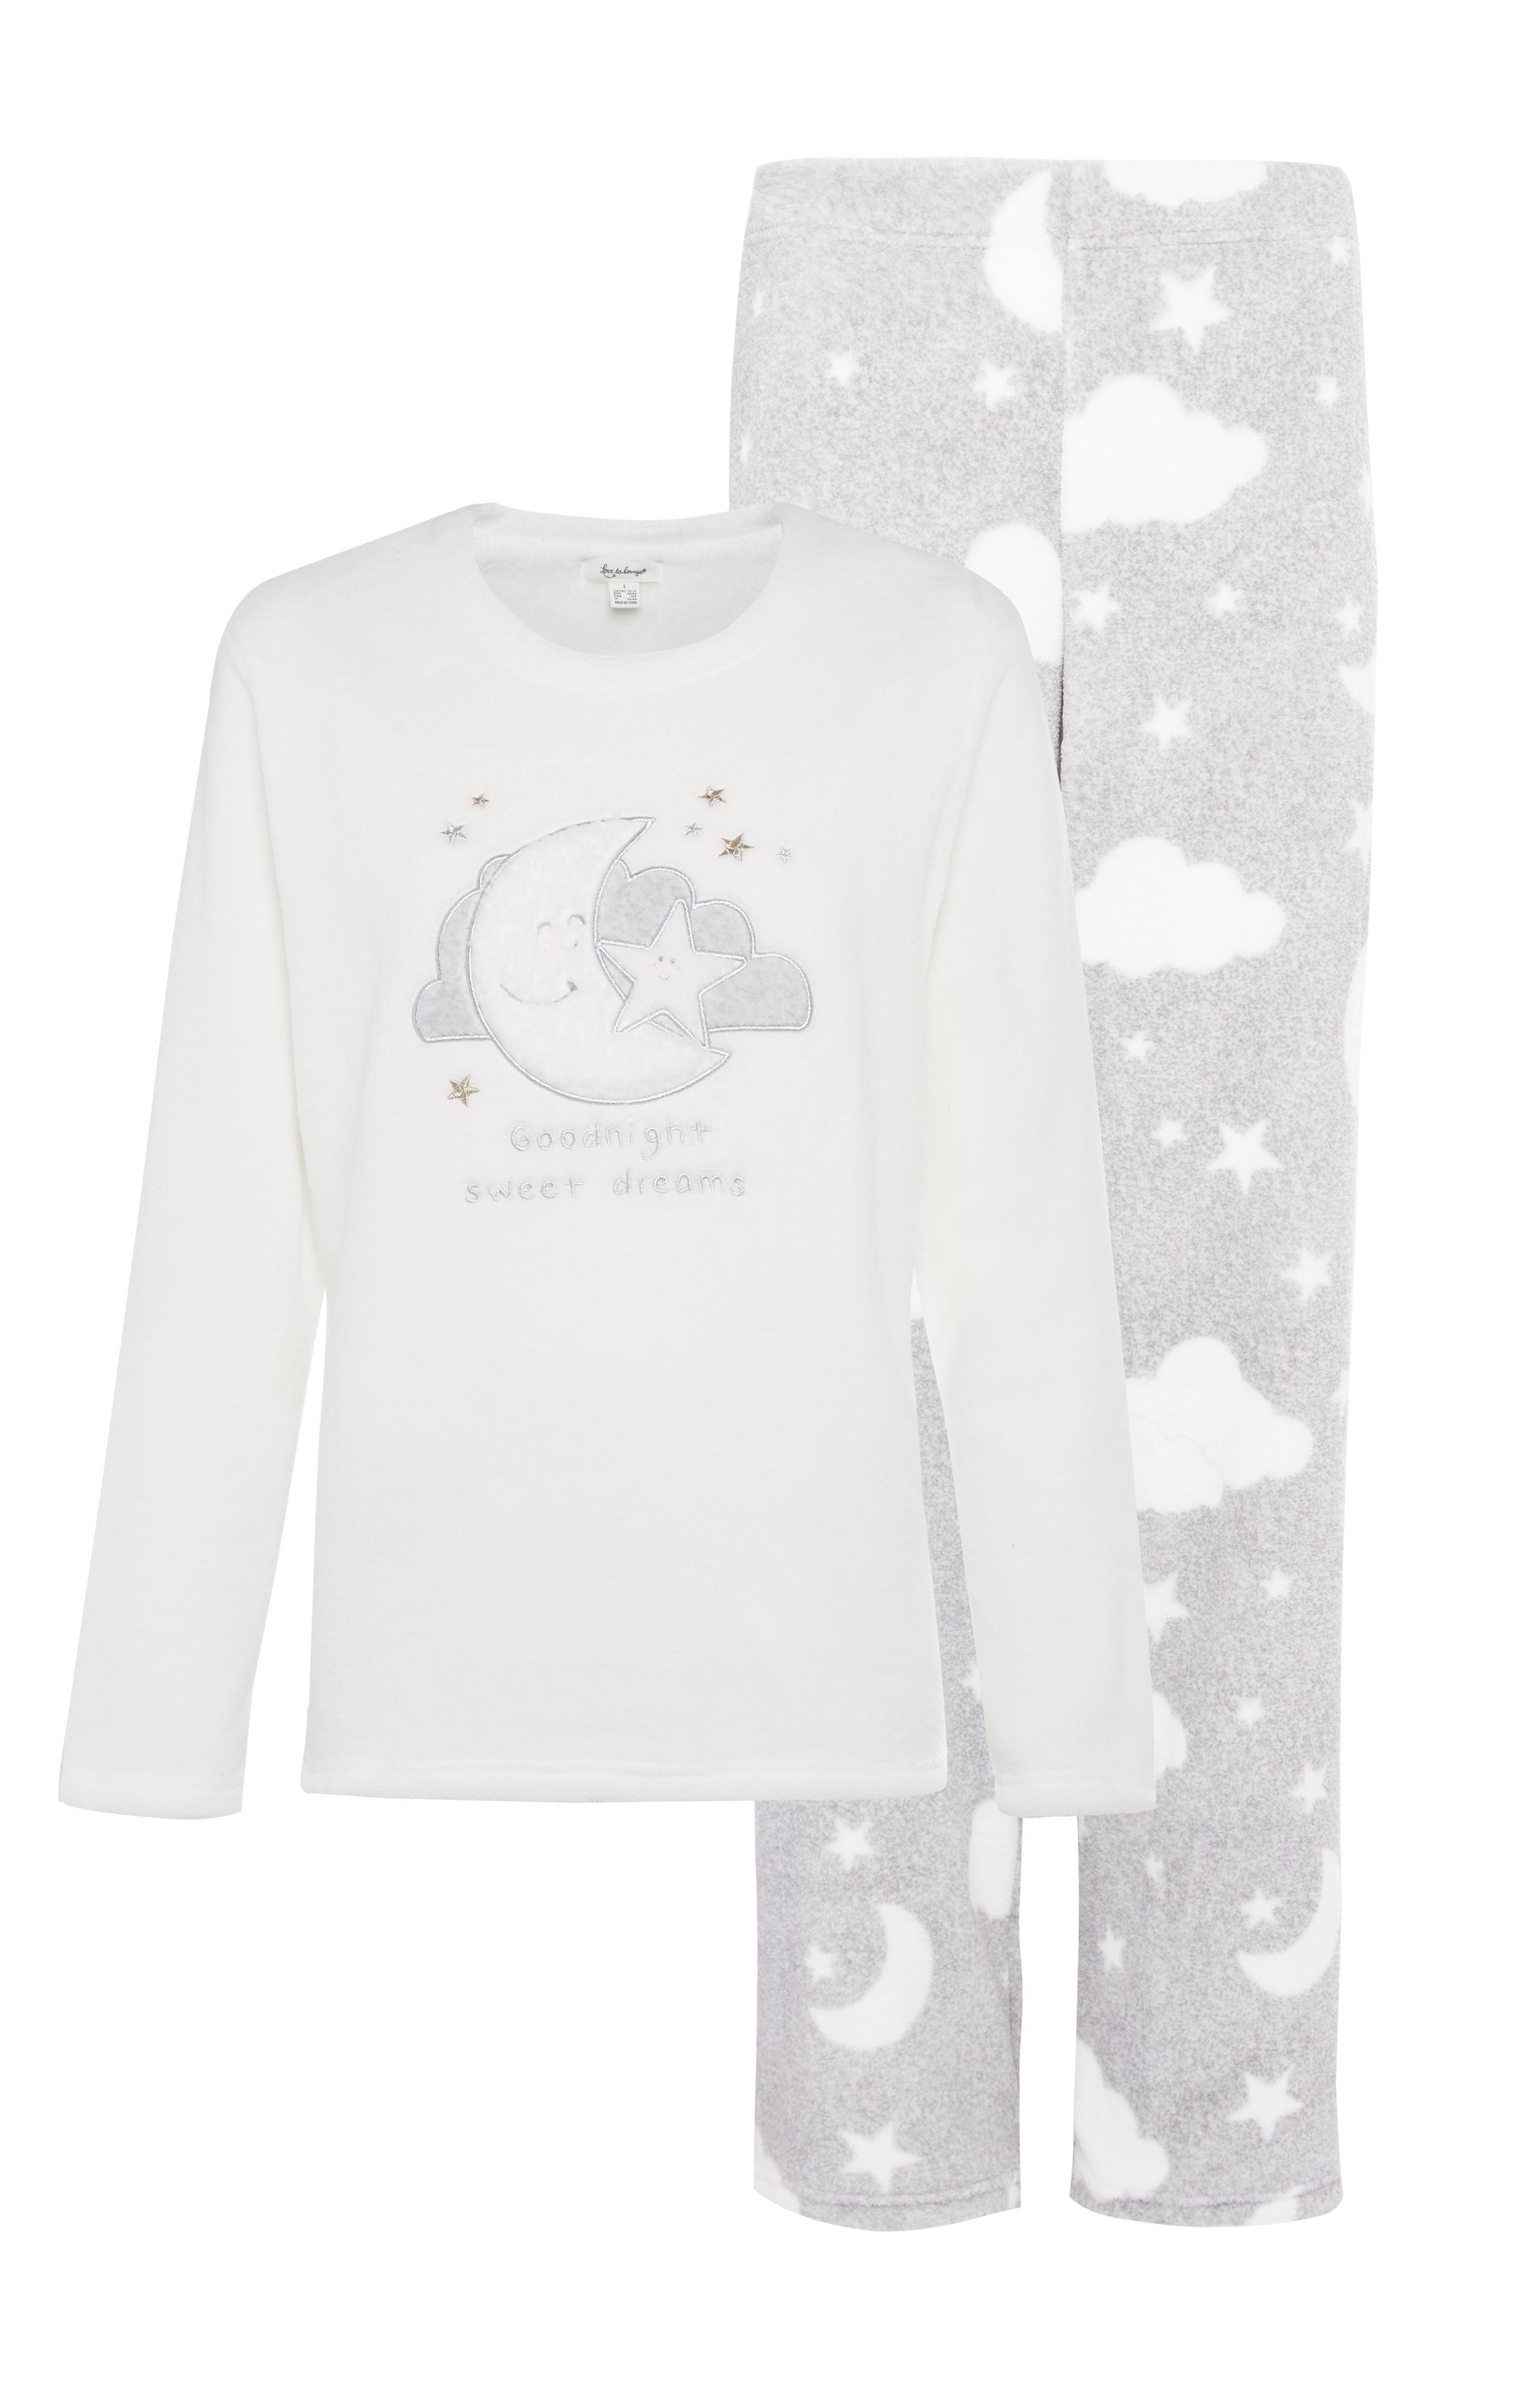 damen aristocats pj set disney marie pyjamas primark vest